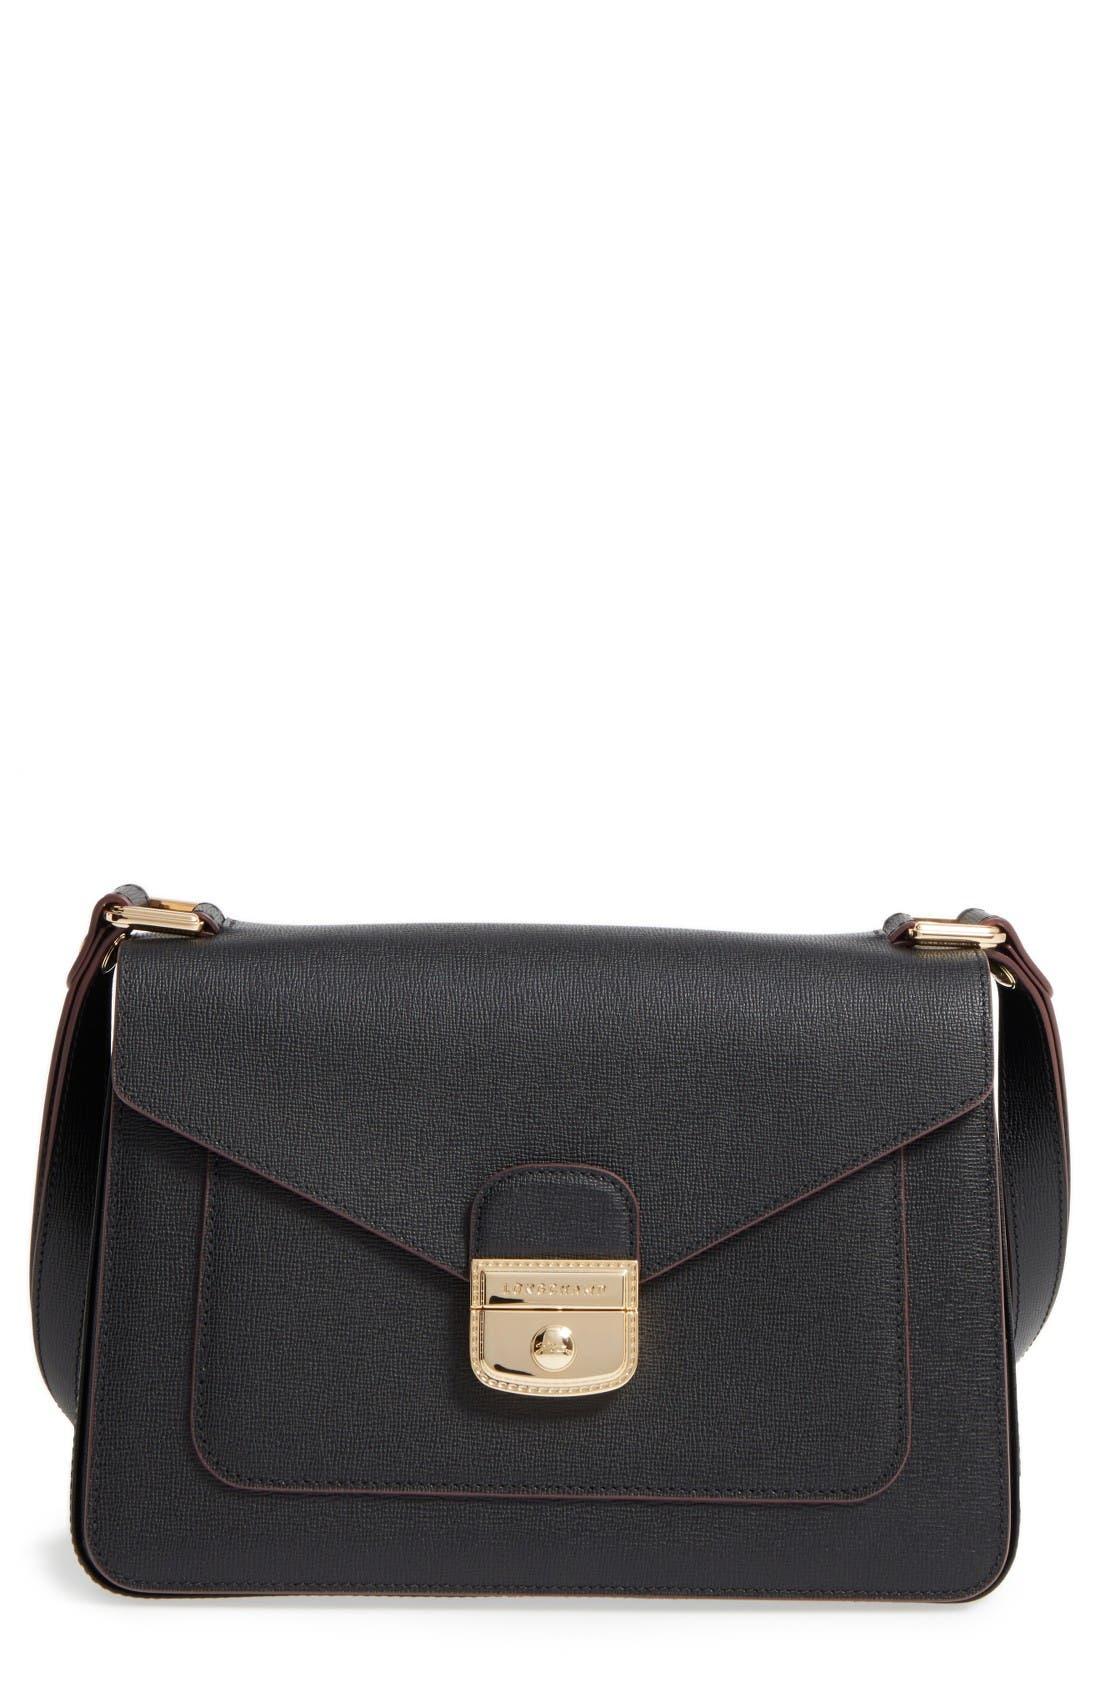 Longchamp Pliage Heritage Leather Shoulder Bag